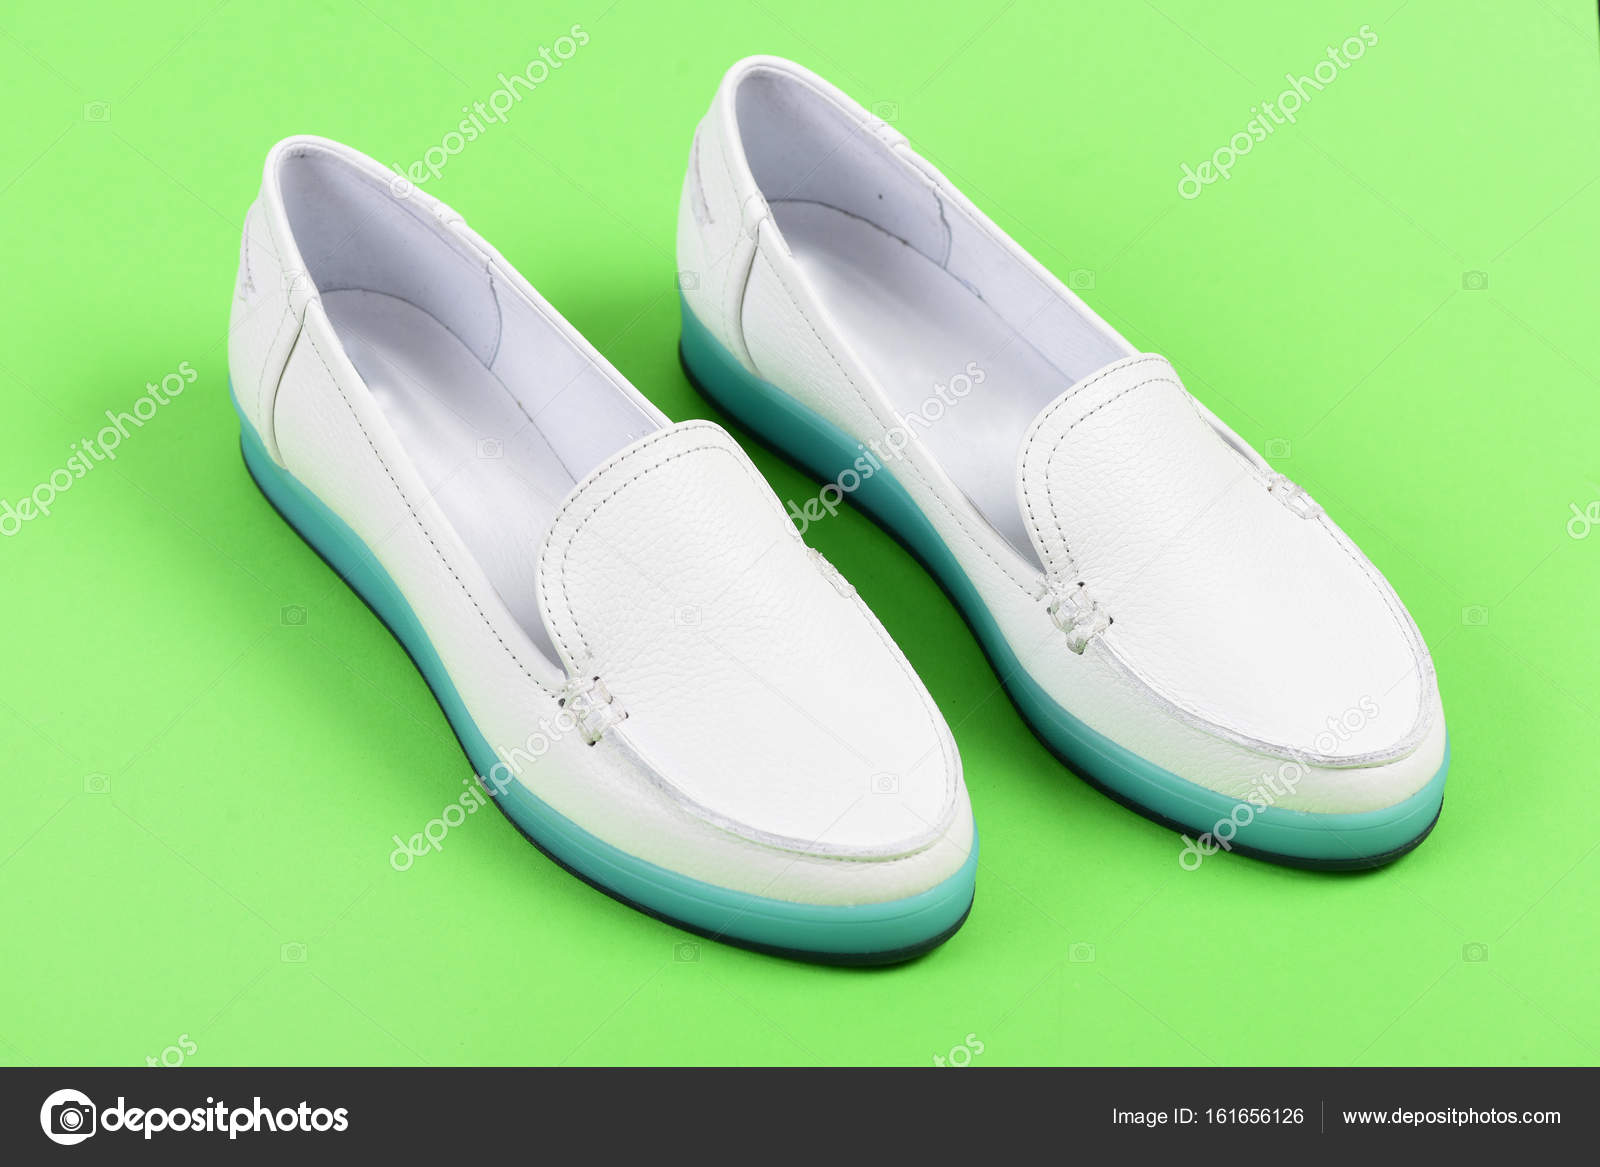 e0ec9508914 Μοκασίνια για γυναίκες σε λευκό χρώμα. Ζευγάρι γυναικεία παπούτσια ...